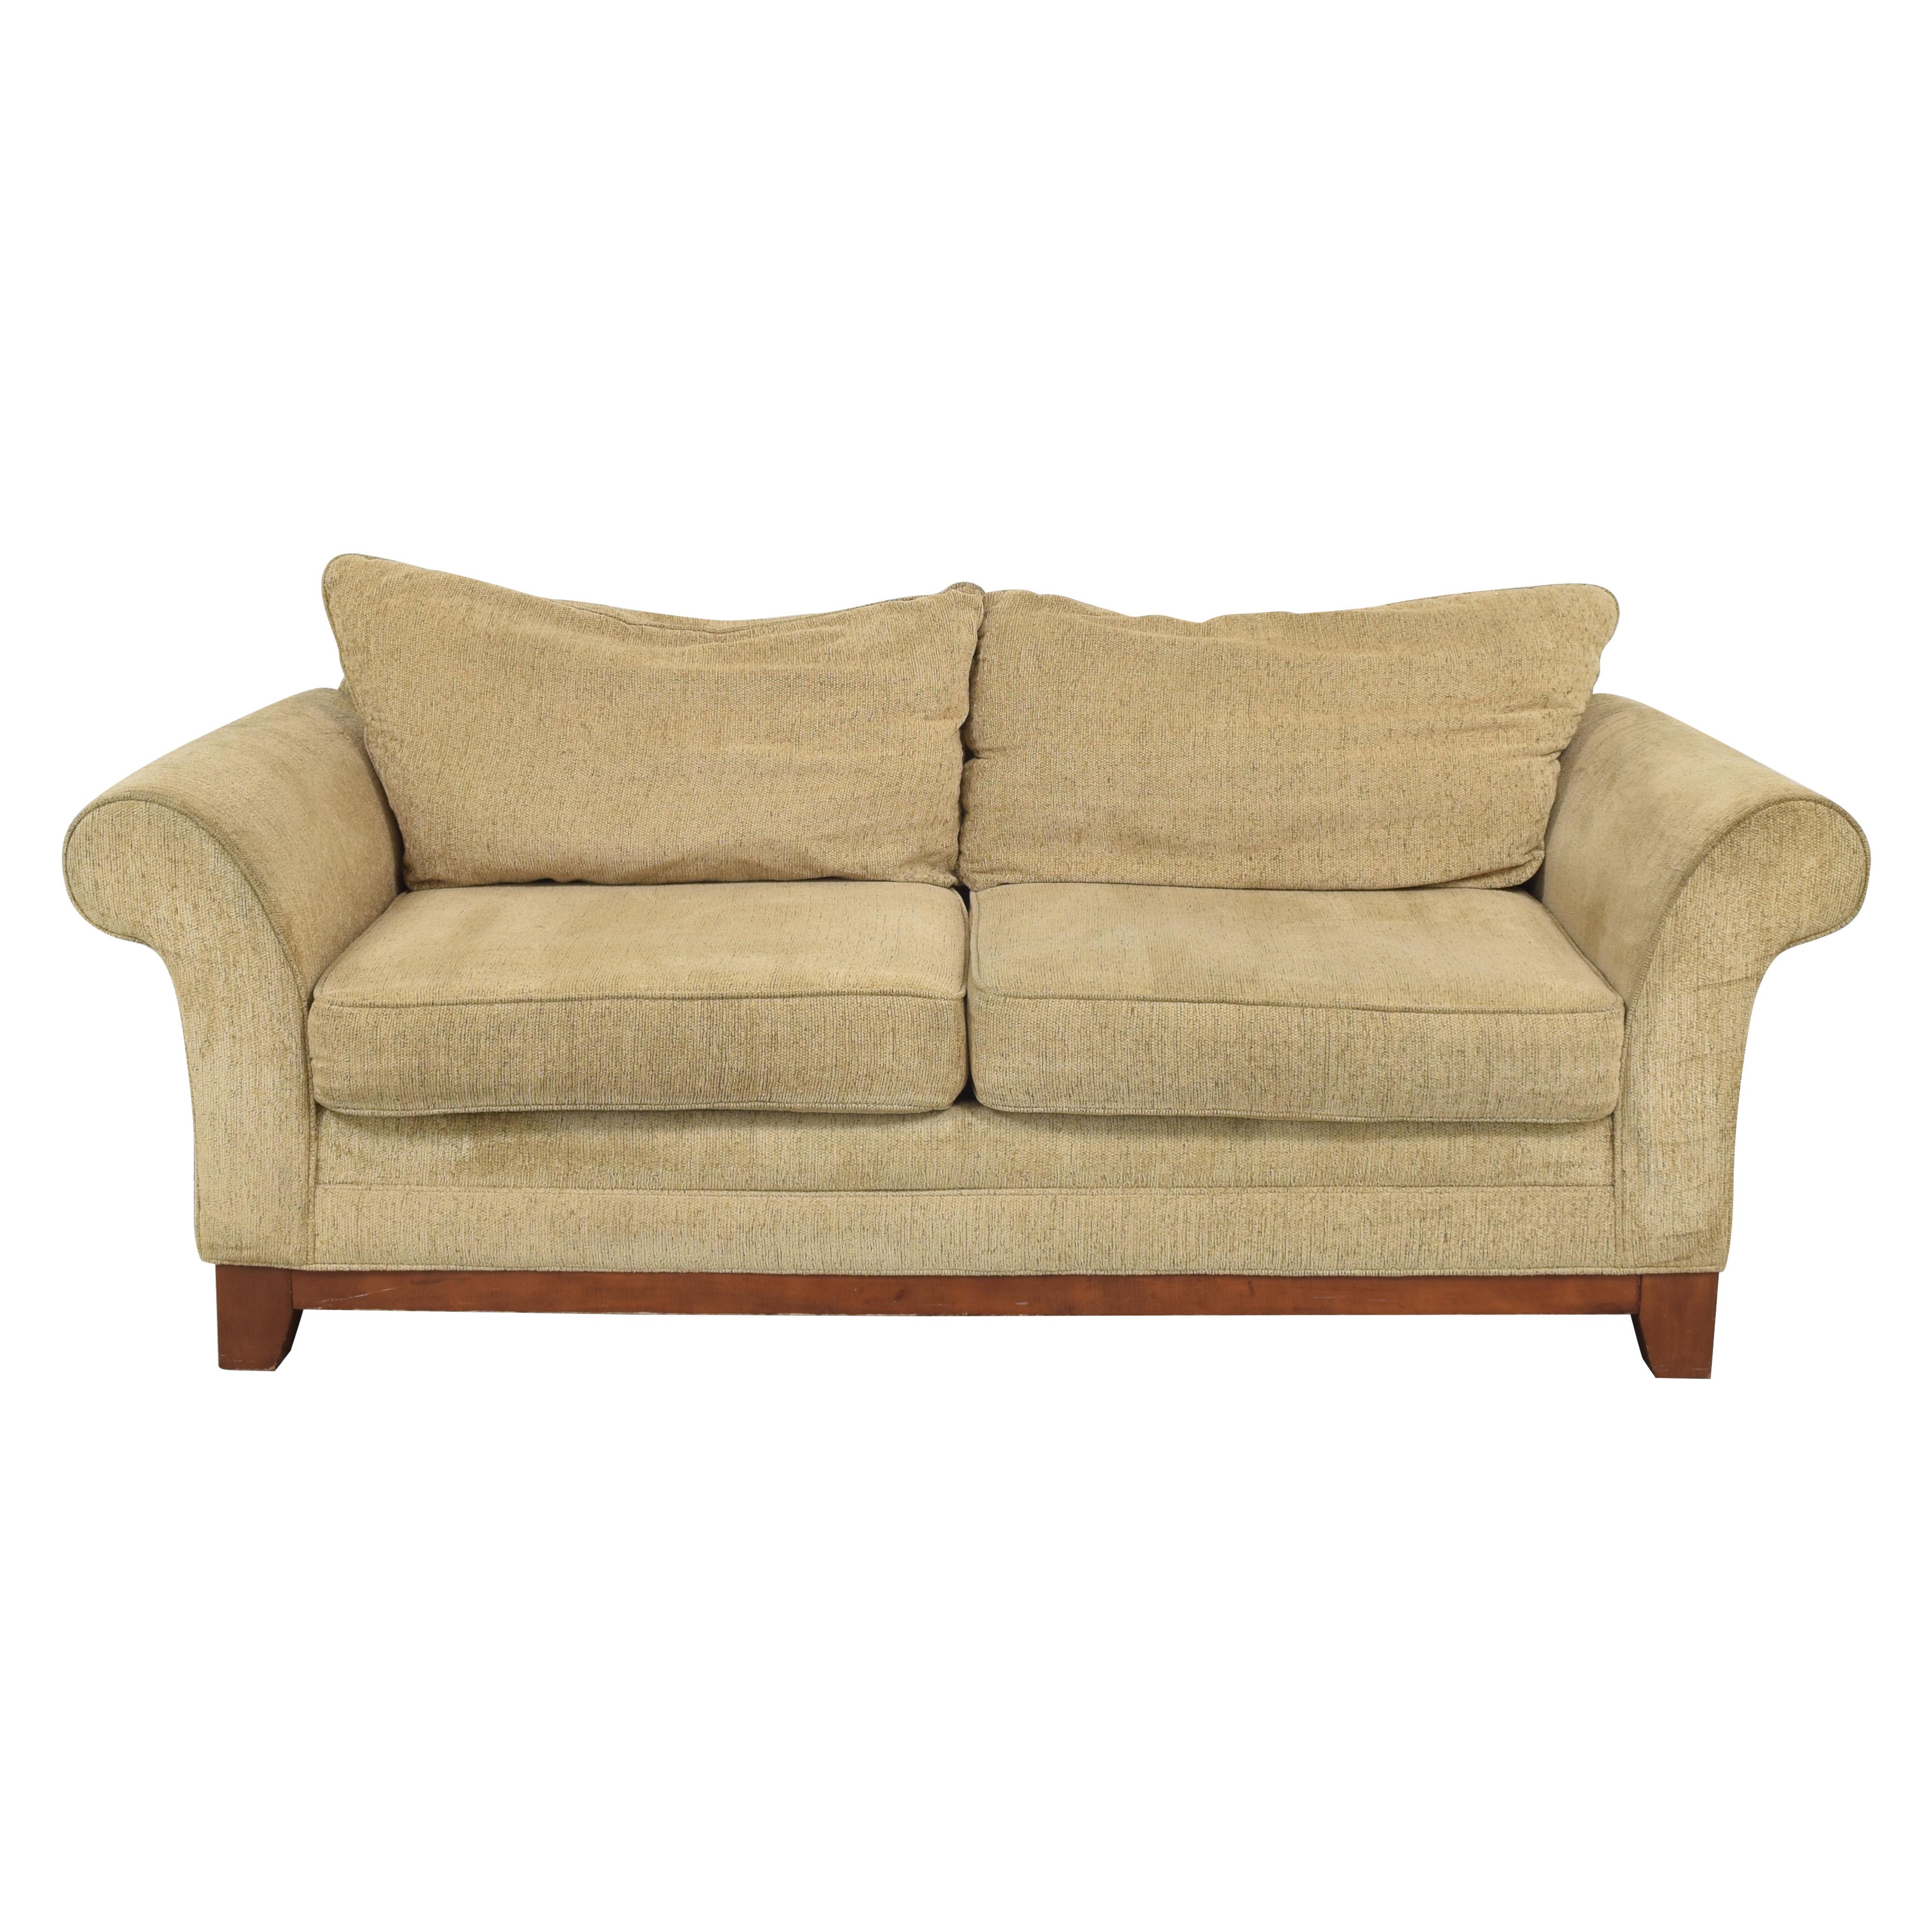 Rolled Arm Two Cushion Sofa nj